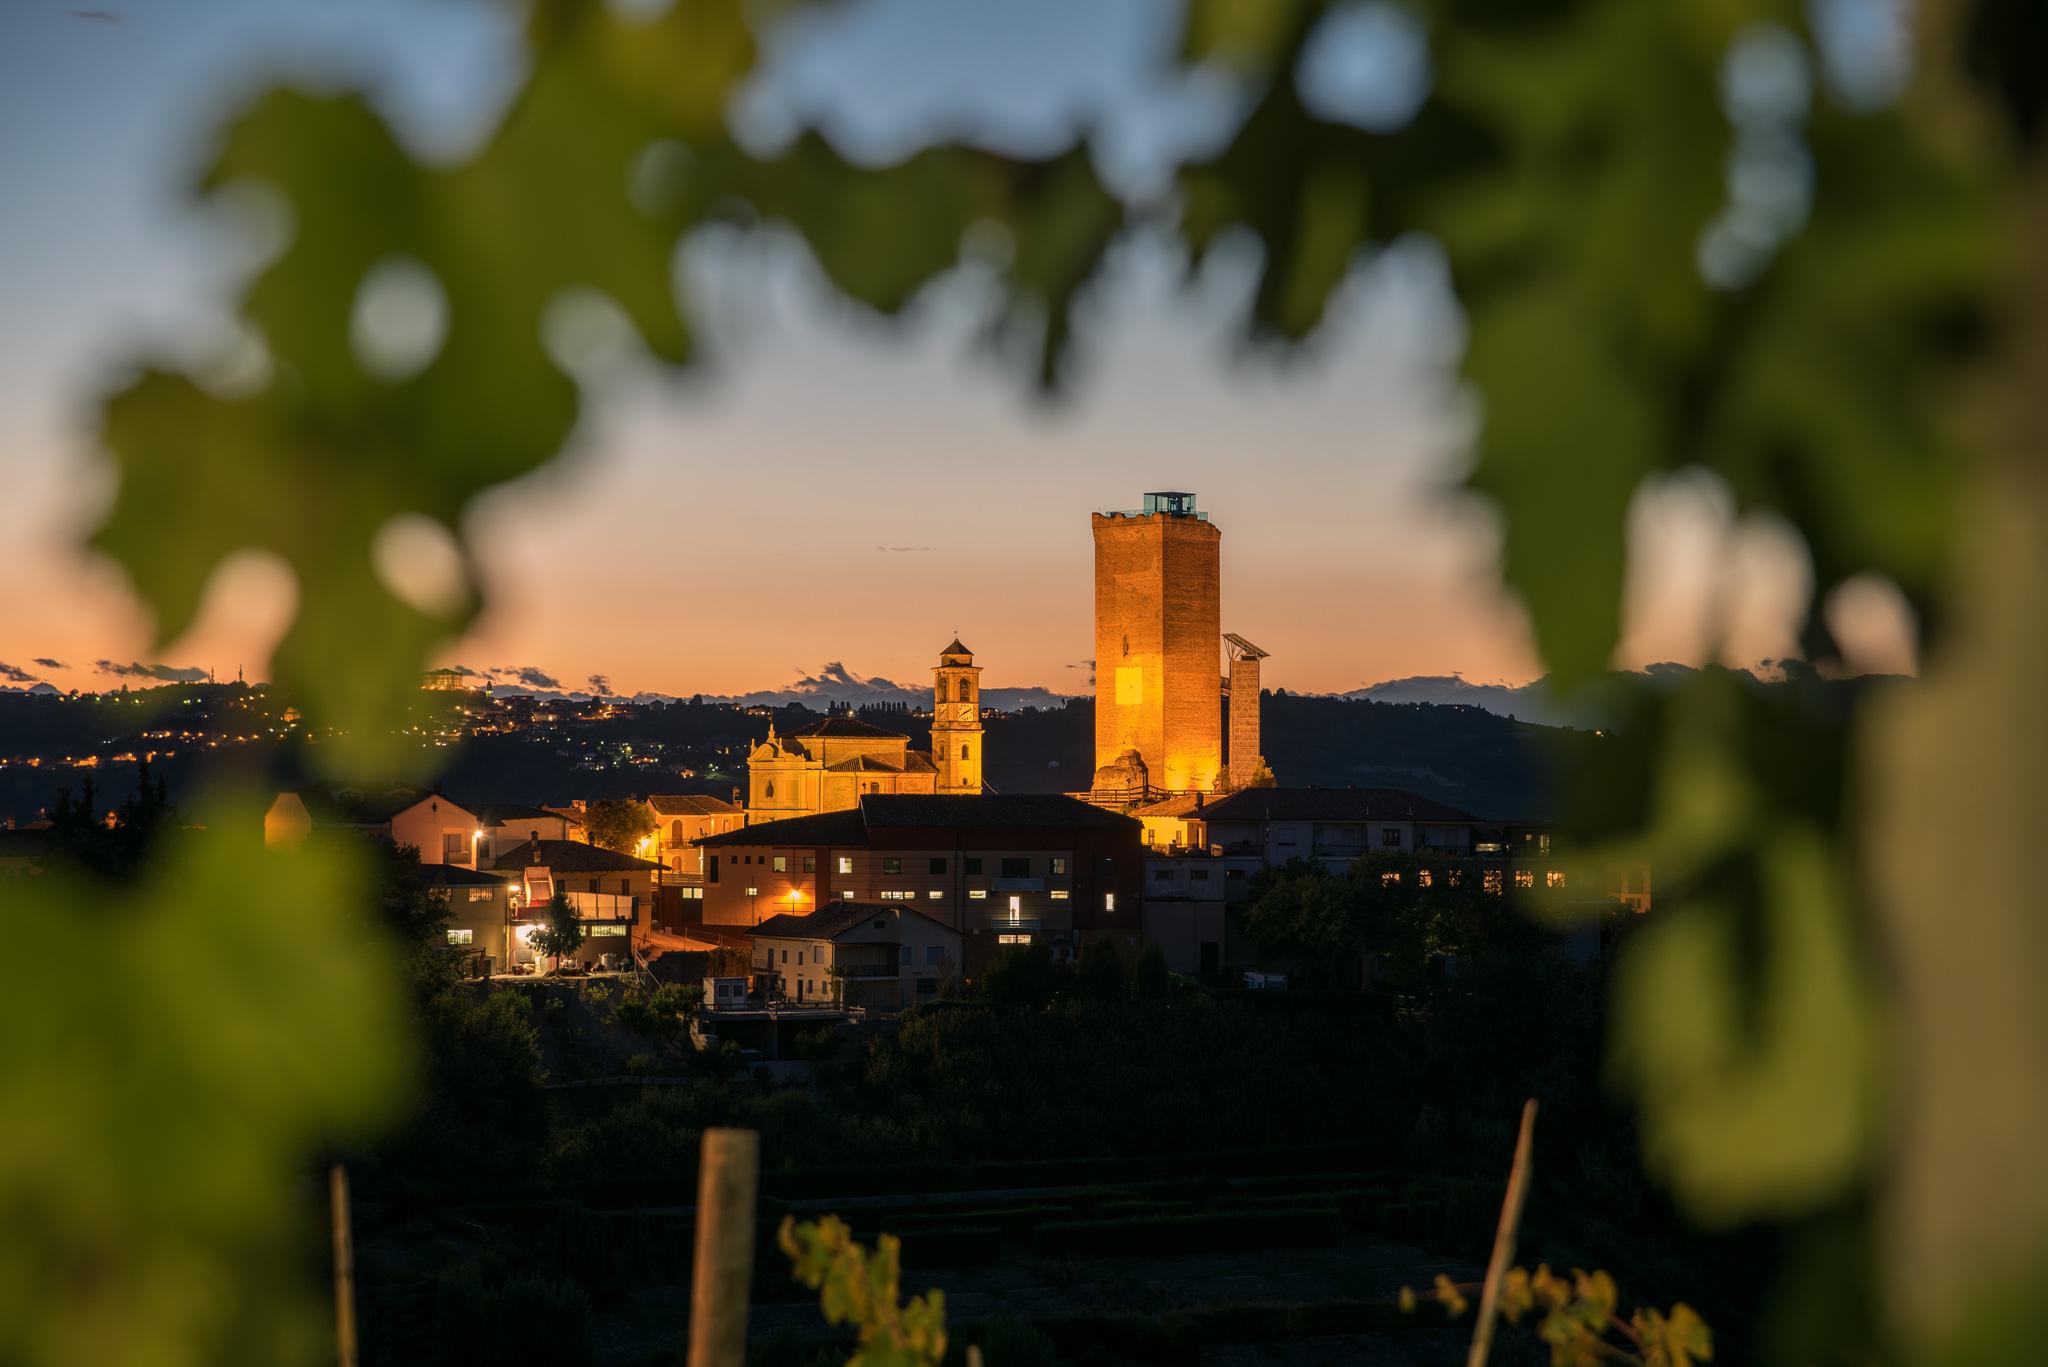 Paesaggi-Italia - Emanuele Tibaldi Fotografo Barbaresco - Torre-di-Barbaresco-al-tramonto-Tramonto-nelle-Langhe - Fotografo-di-paesaggi-Barbaresco-Torre-paesaggio-notturno-nelle-langhe